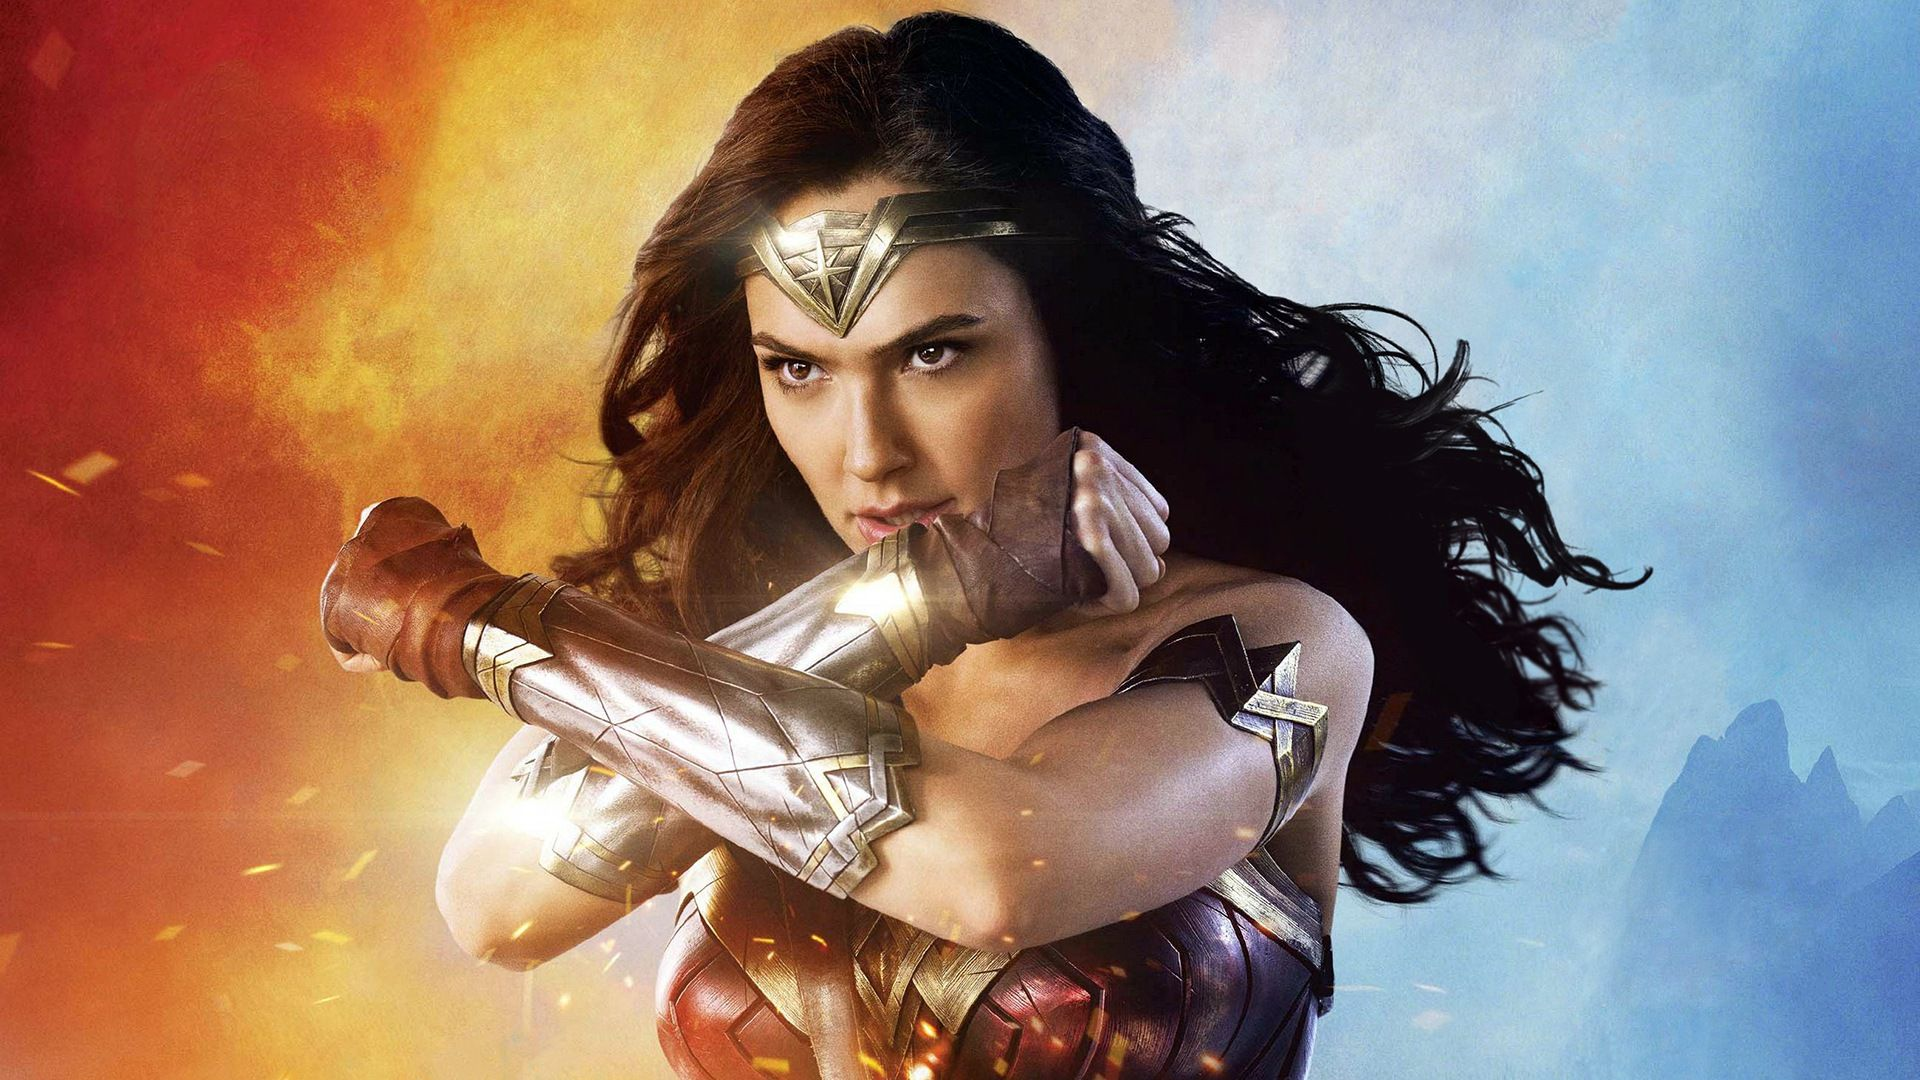 "<p>DC三巨頭、影史第一位登上大螢幕的女性超級英雄——擁有女神美貌還有超強戰鬥力,每次出場都會自帶 BGM 的《神力女超人》絕對是今年女生最應該要看的電影之一,蓋兒賈多特敬業的動作演出非常帥氣、讓人想怒衝一發健身房之外;正如蓋兒本人過去受訪時提到希望自己的演出能成為女兒的好榜樣,這名為愛與正義而戰的女英雄在片中也給予女孩子非常多的啟發,以下就列出看完《神力女超人》後我們能學到的 8 件事,說不定會讓妳更愛這個角色。<span class=""redactor-invisible-space"" data-verified=""redactor"" data-redactor-tag=""span"" data-redactor-class=""redactor-invisible-space""></span></p>"